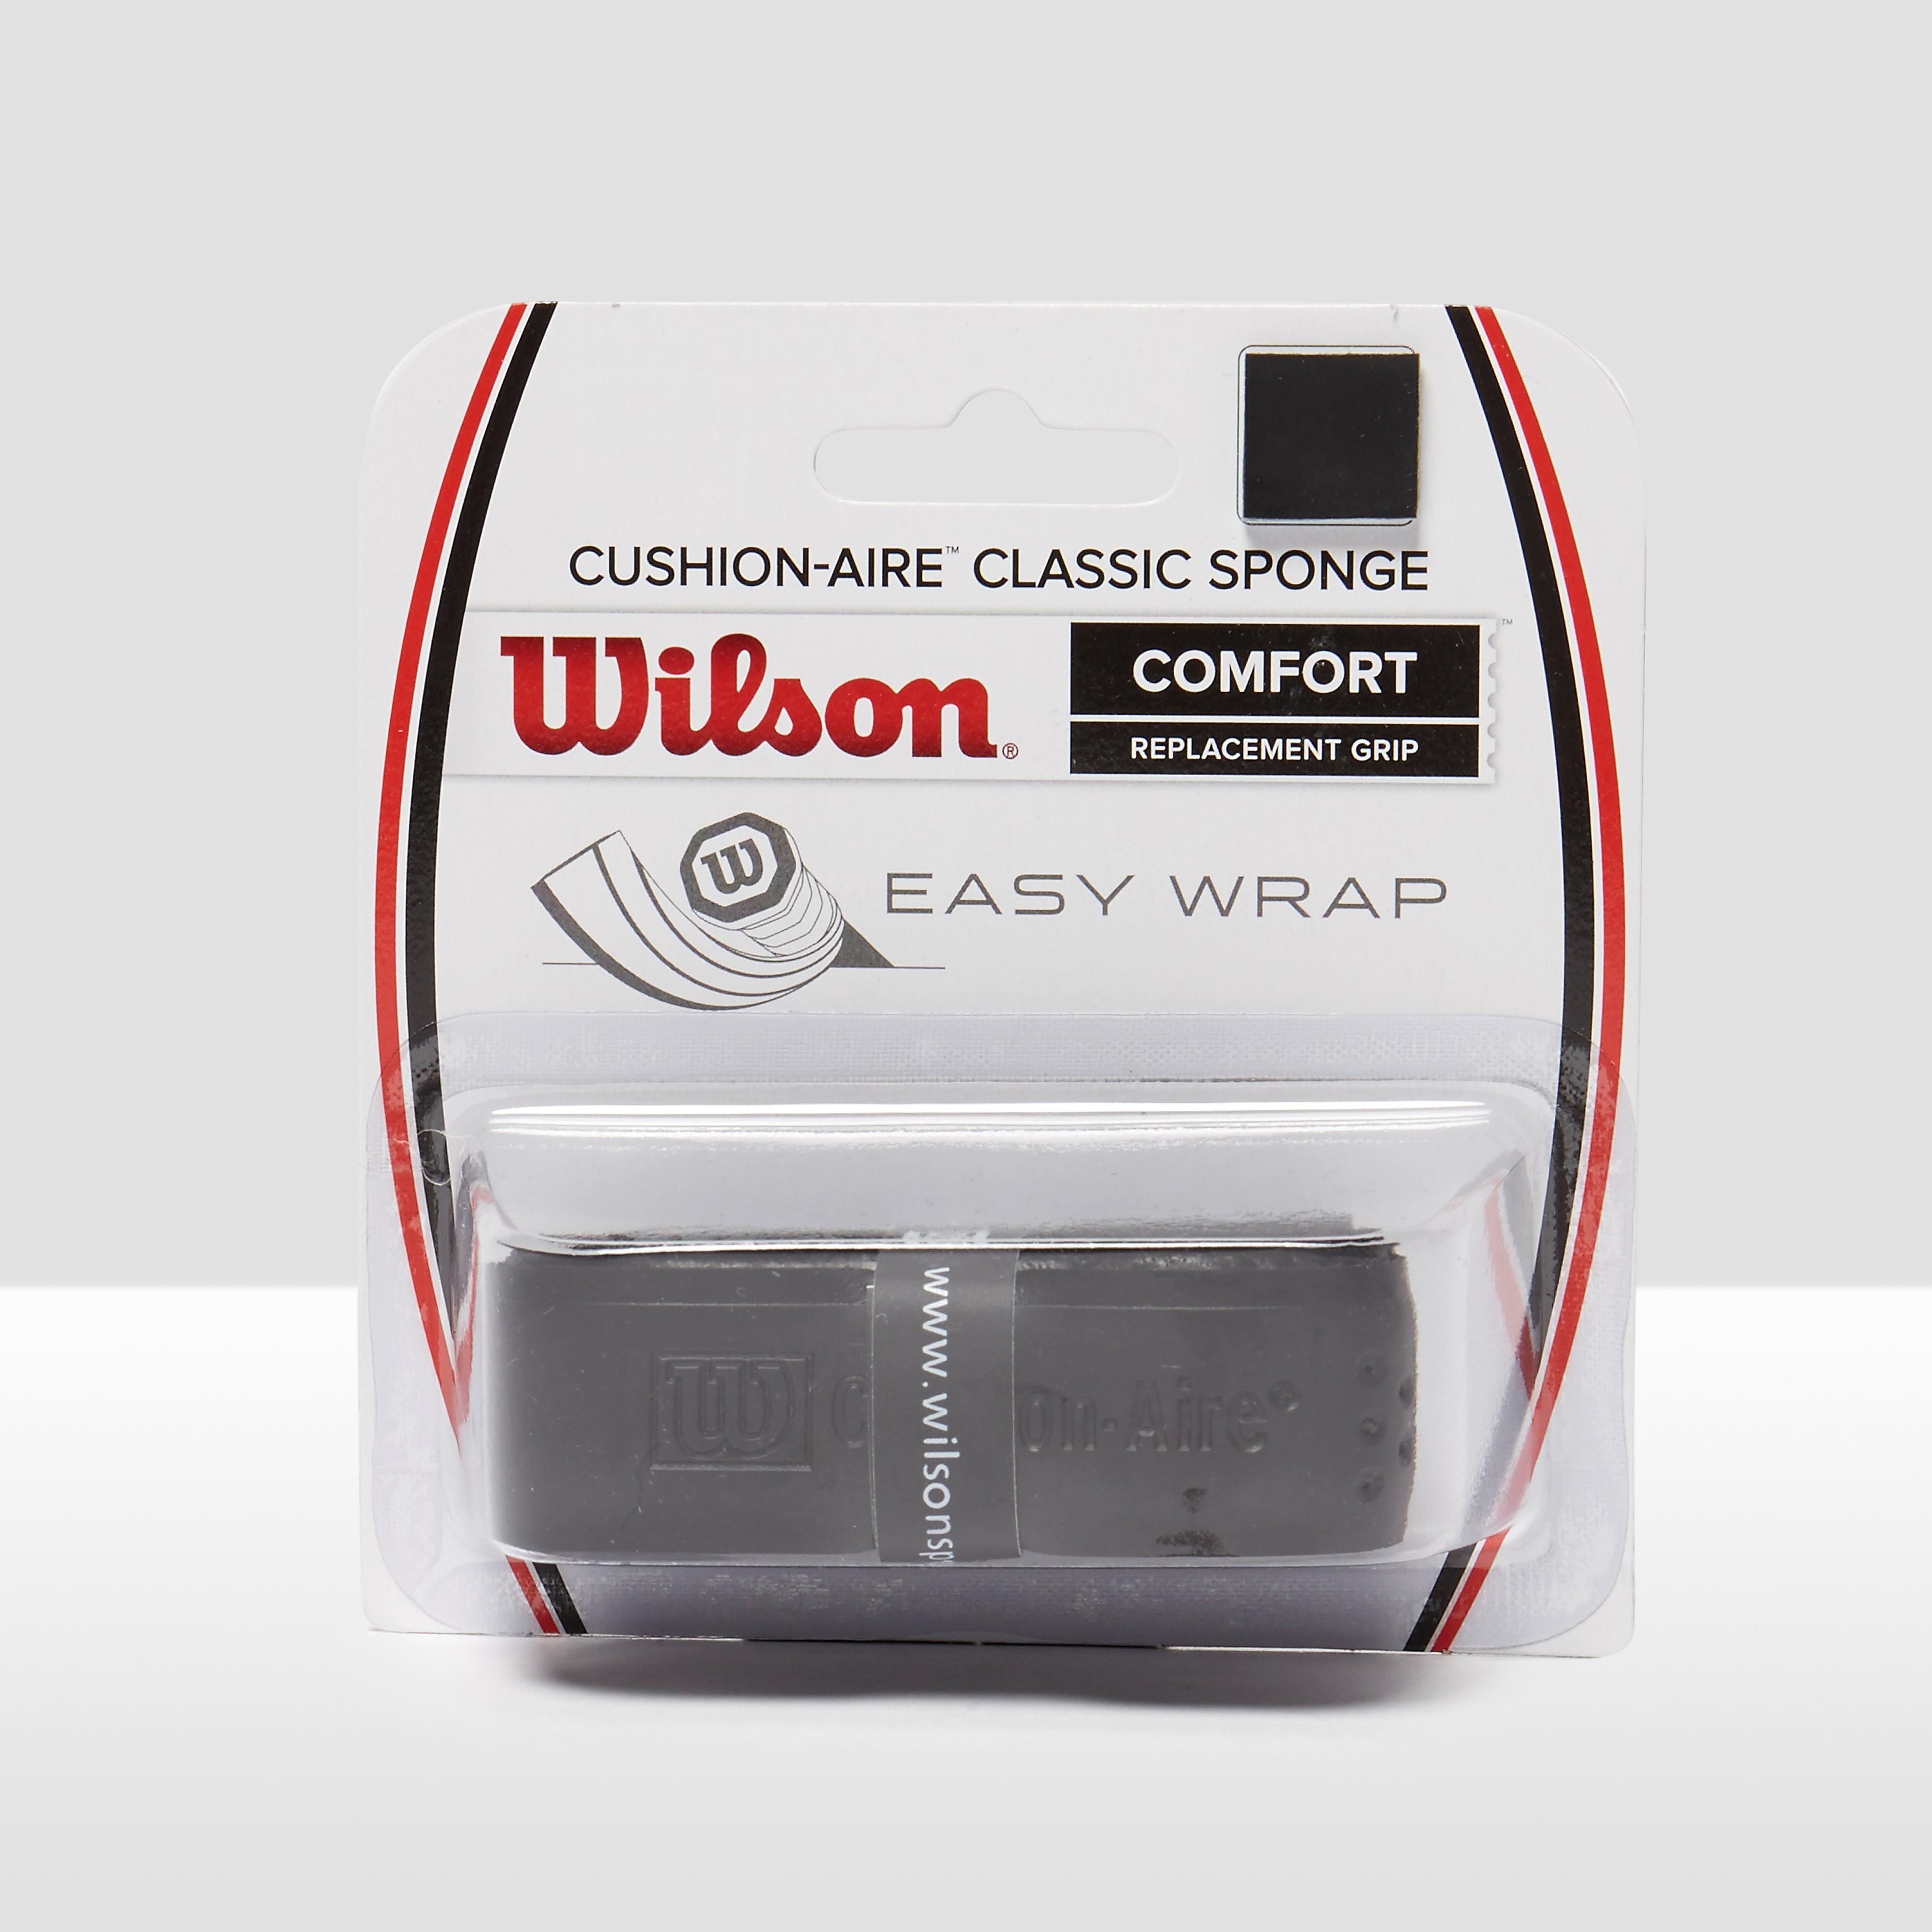 Wilson Sponge Replacement Grip (Pack of 1)